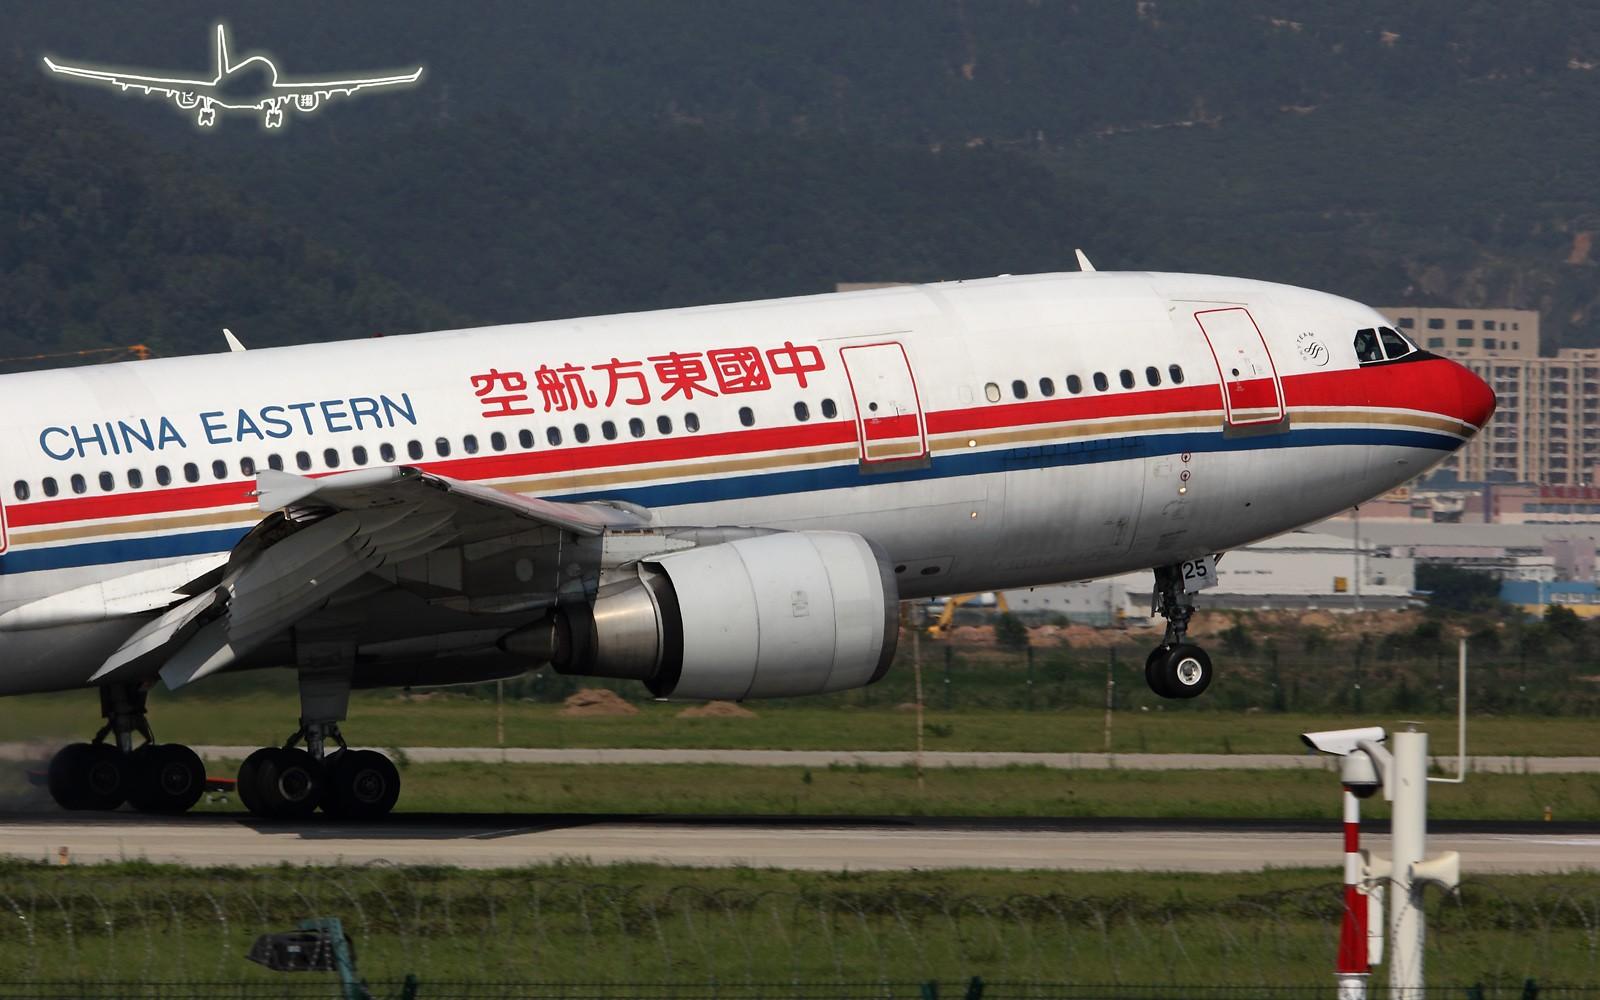 Re:[原创]★ ★ ★ ★ ★  看这AB6的仰角,想玩擦尾吗? ★ ★ ★ ★ ★ AIRBUS A300-B4-600 B-2325 中国深圳宝安机场